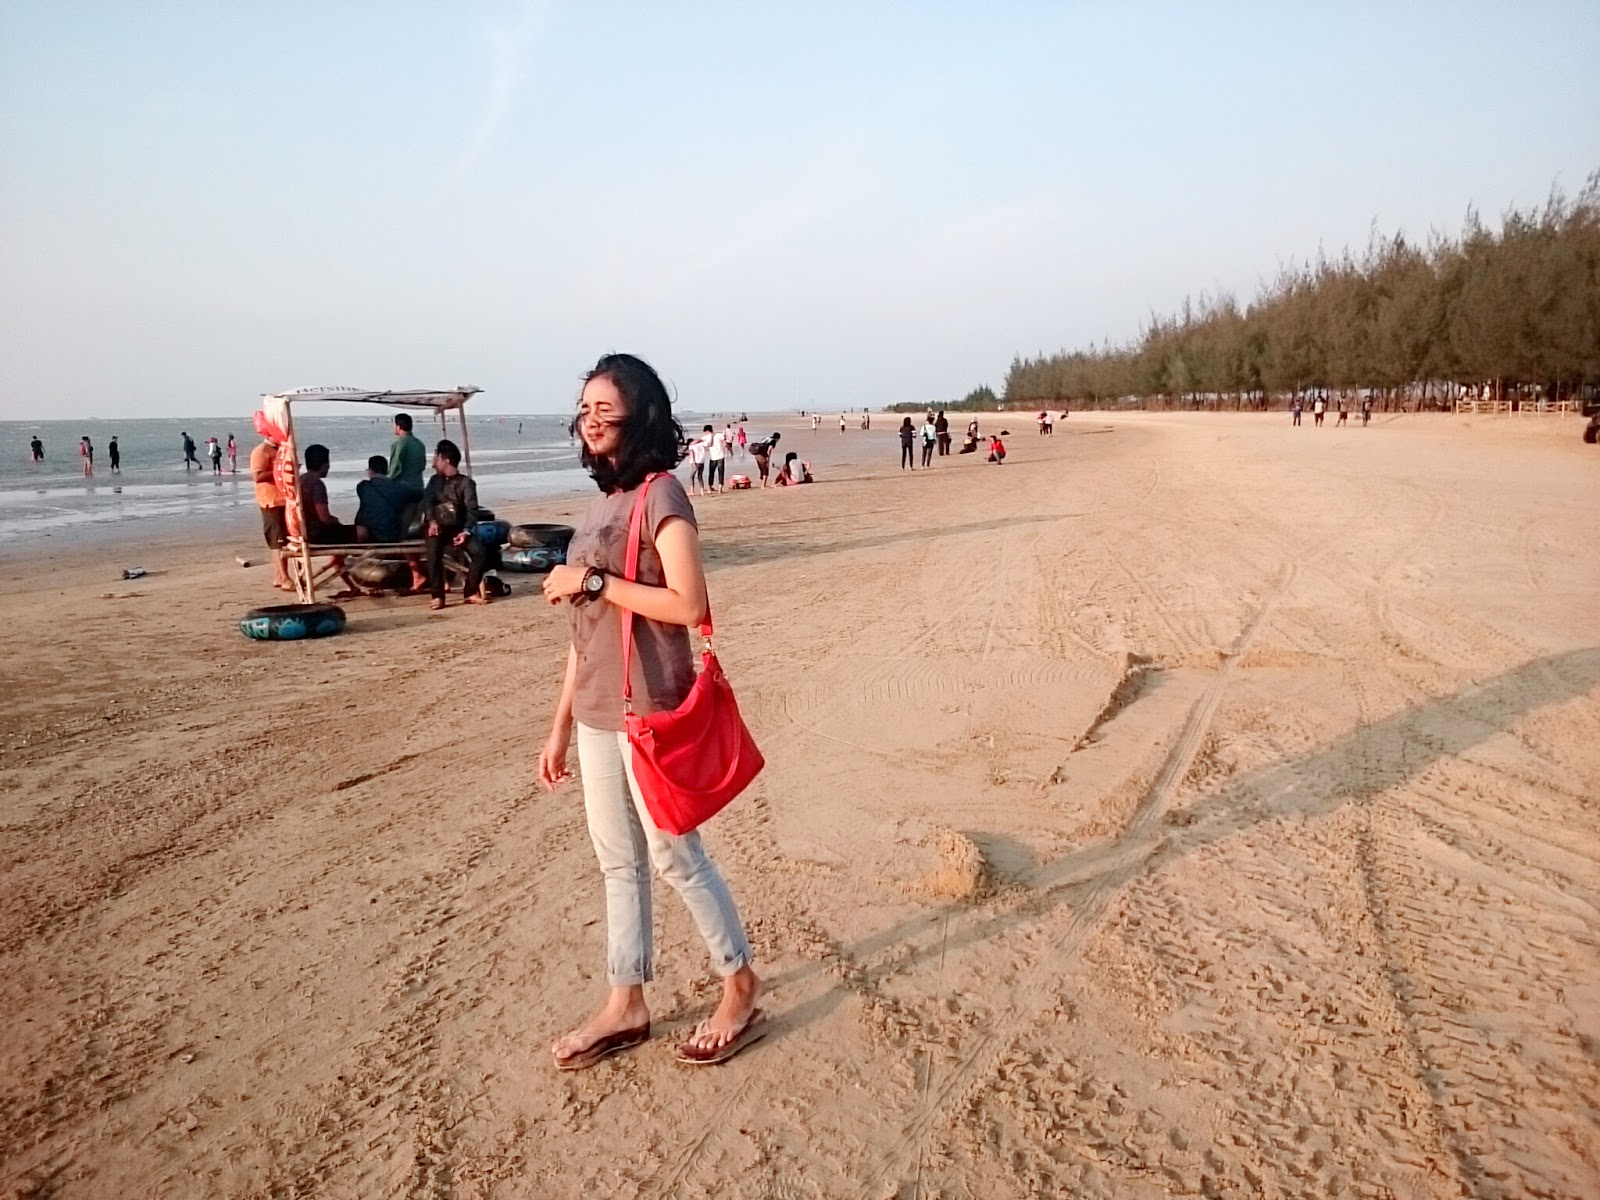 Karang Jahe Beach Lets Happinest Suasana Pantai Kab Rembang